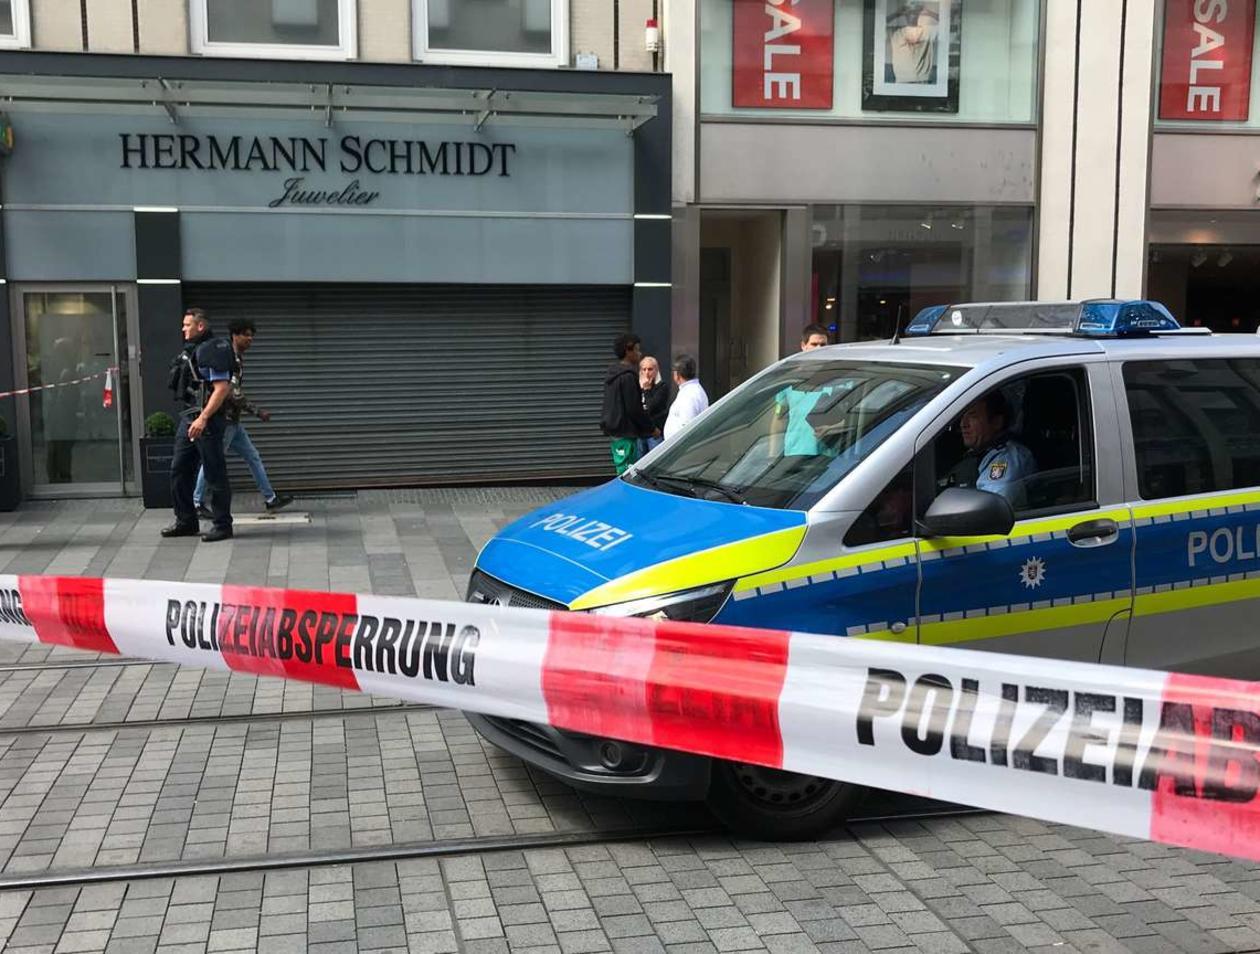 Amokfahrt Scharbeutz auto rast durch fußgängerzone - toughguysproductions